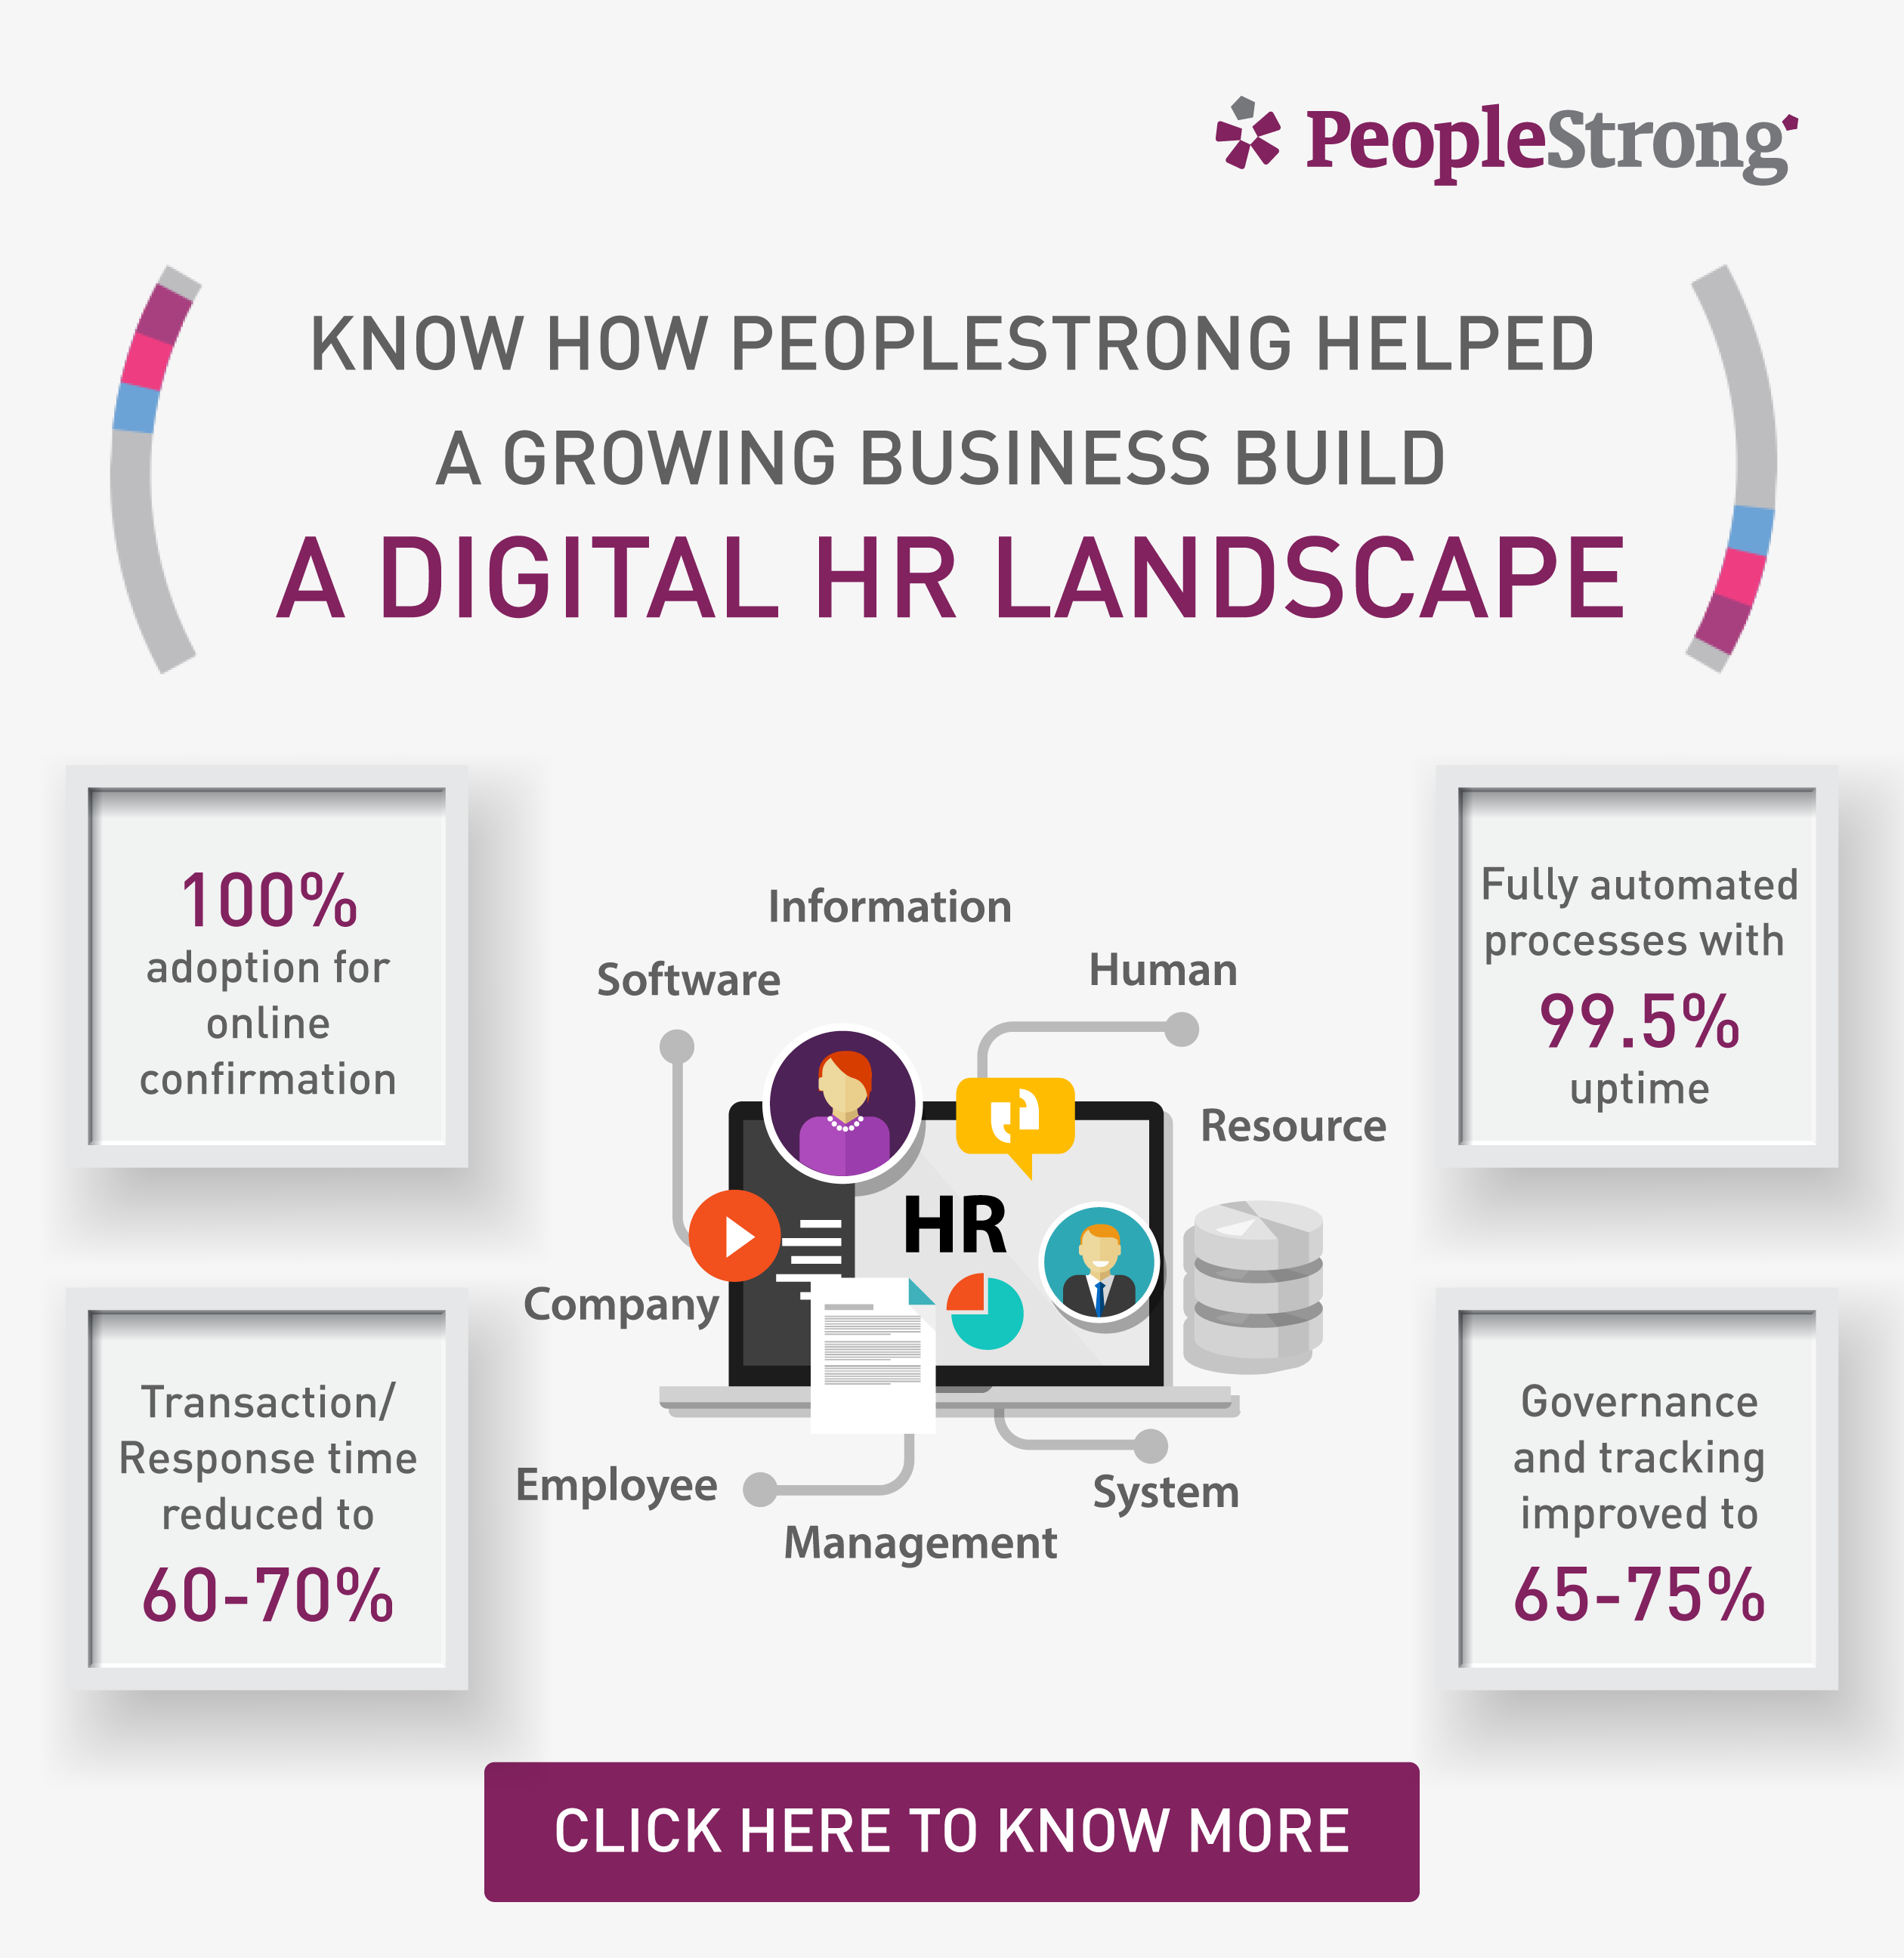 Building a digital HR landscape for a growing busi...